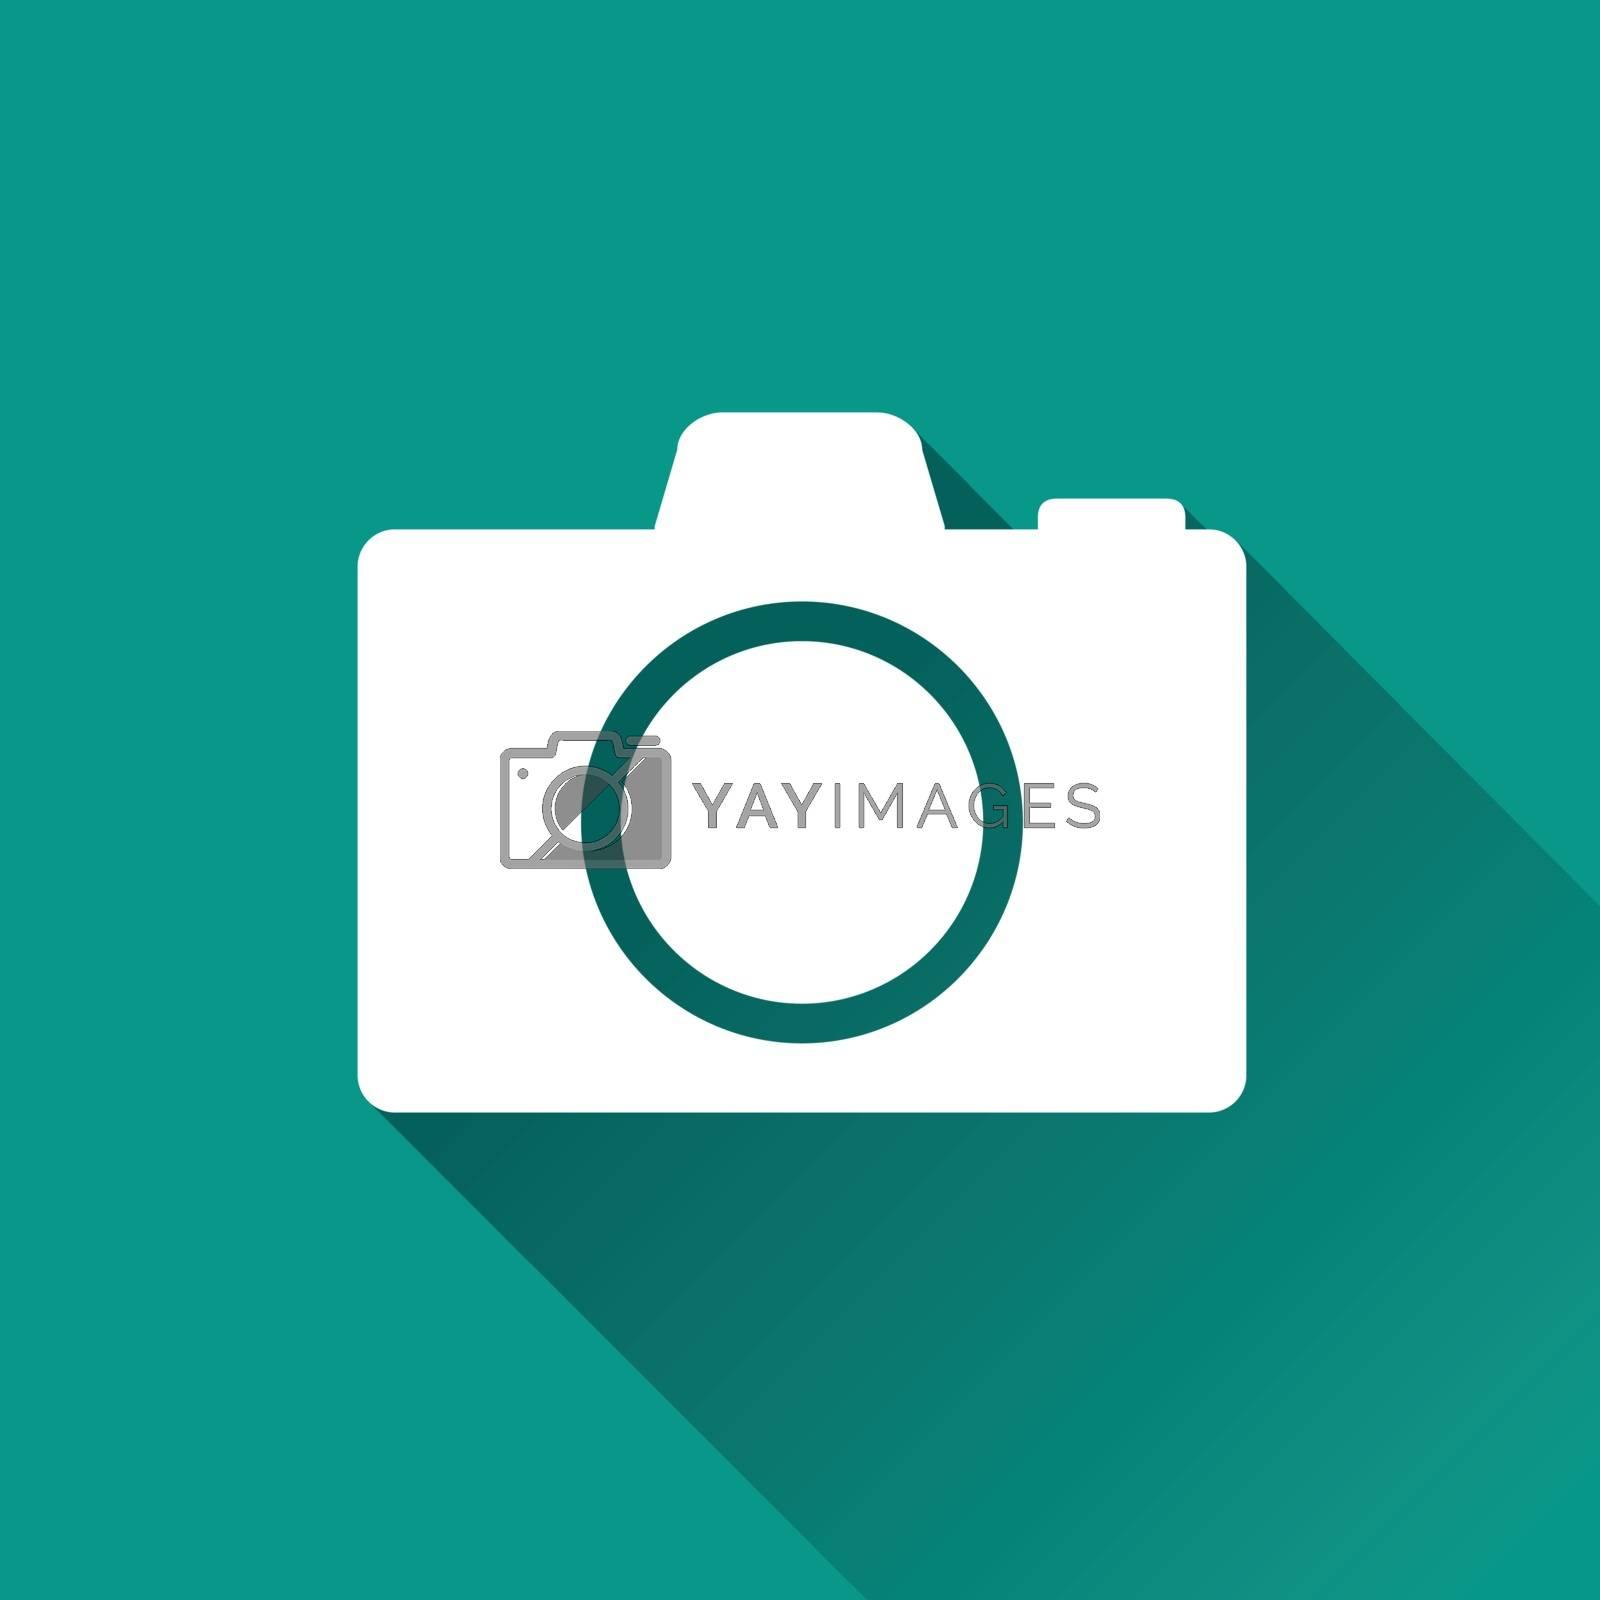 illustration of camera flat design icon isolated